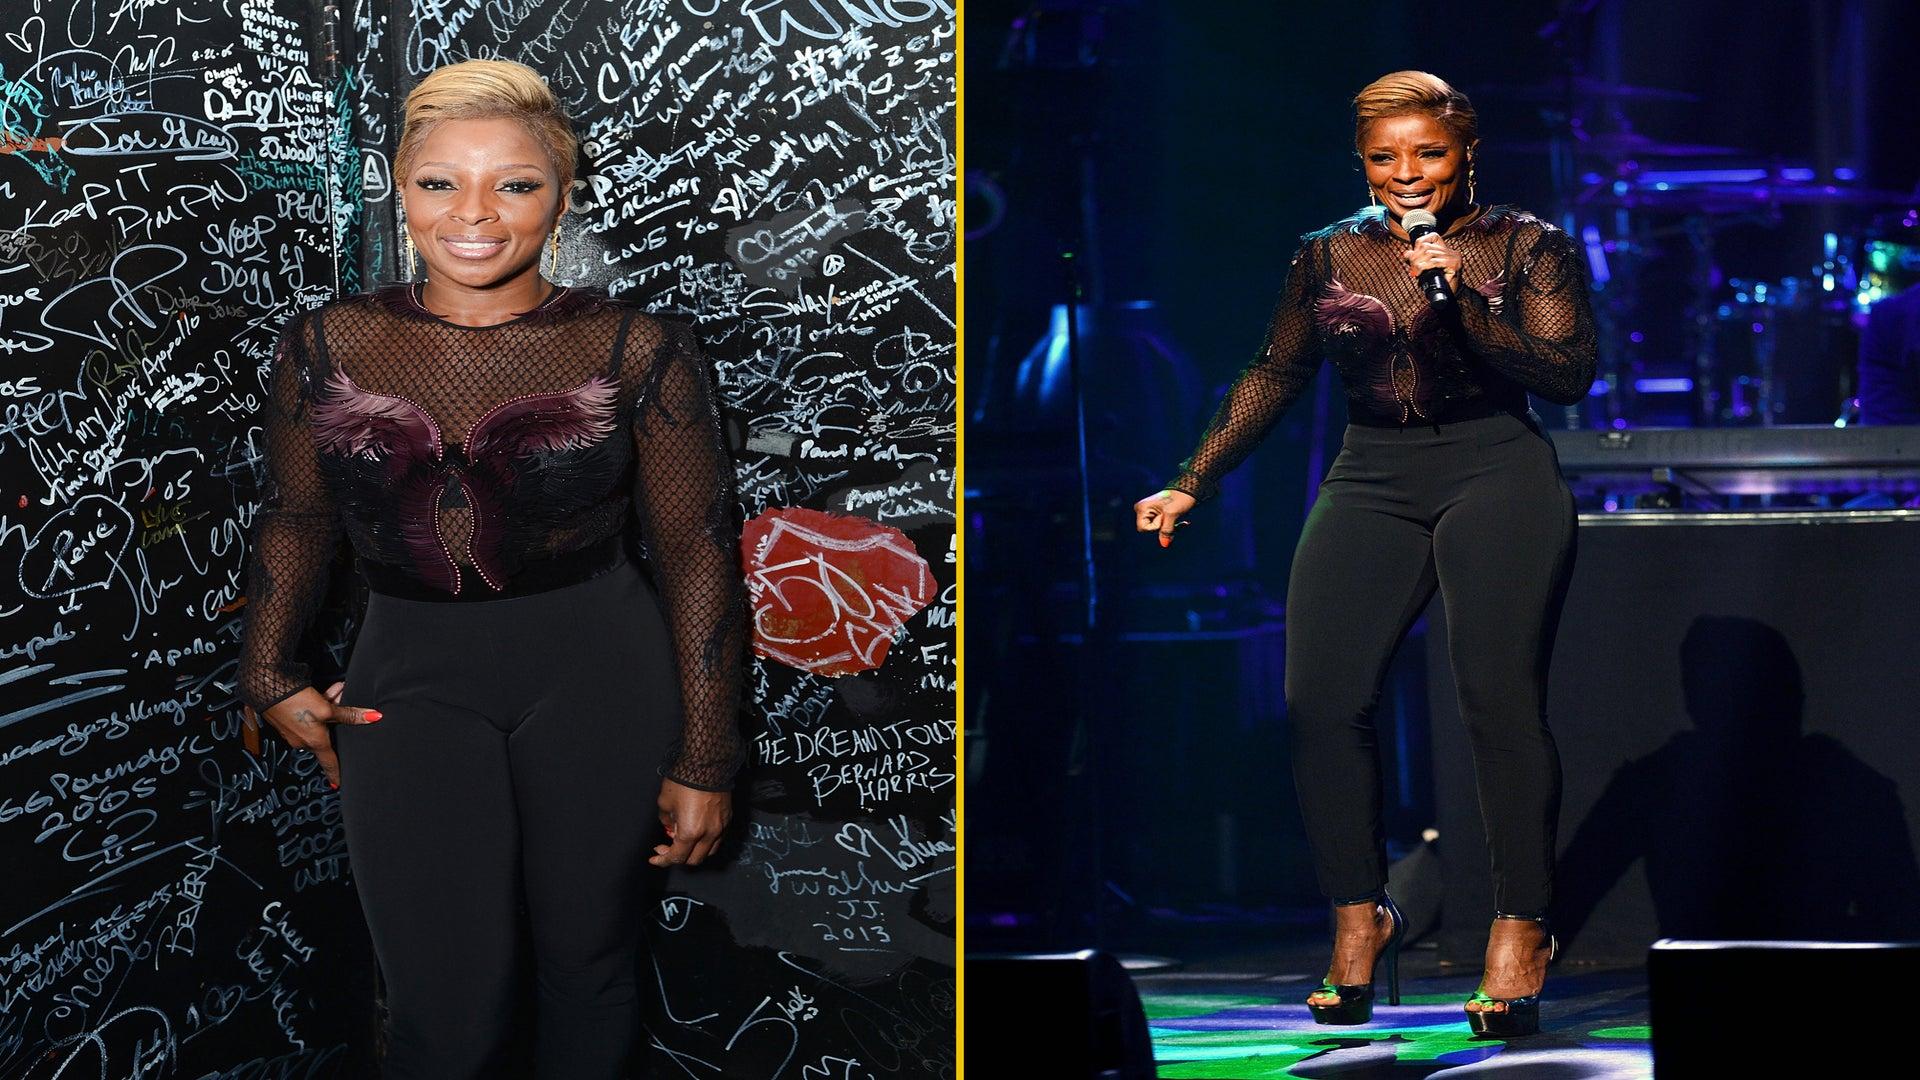 2014 ESSENCE Festival Playlists: Mary J. Blige, Lionel Richie and Erykah Badu